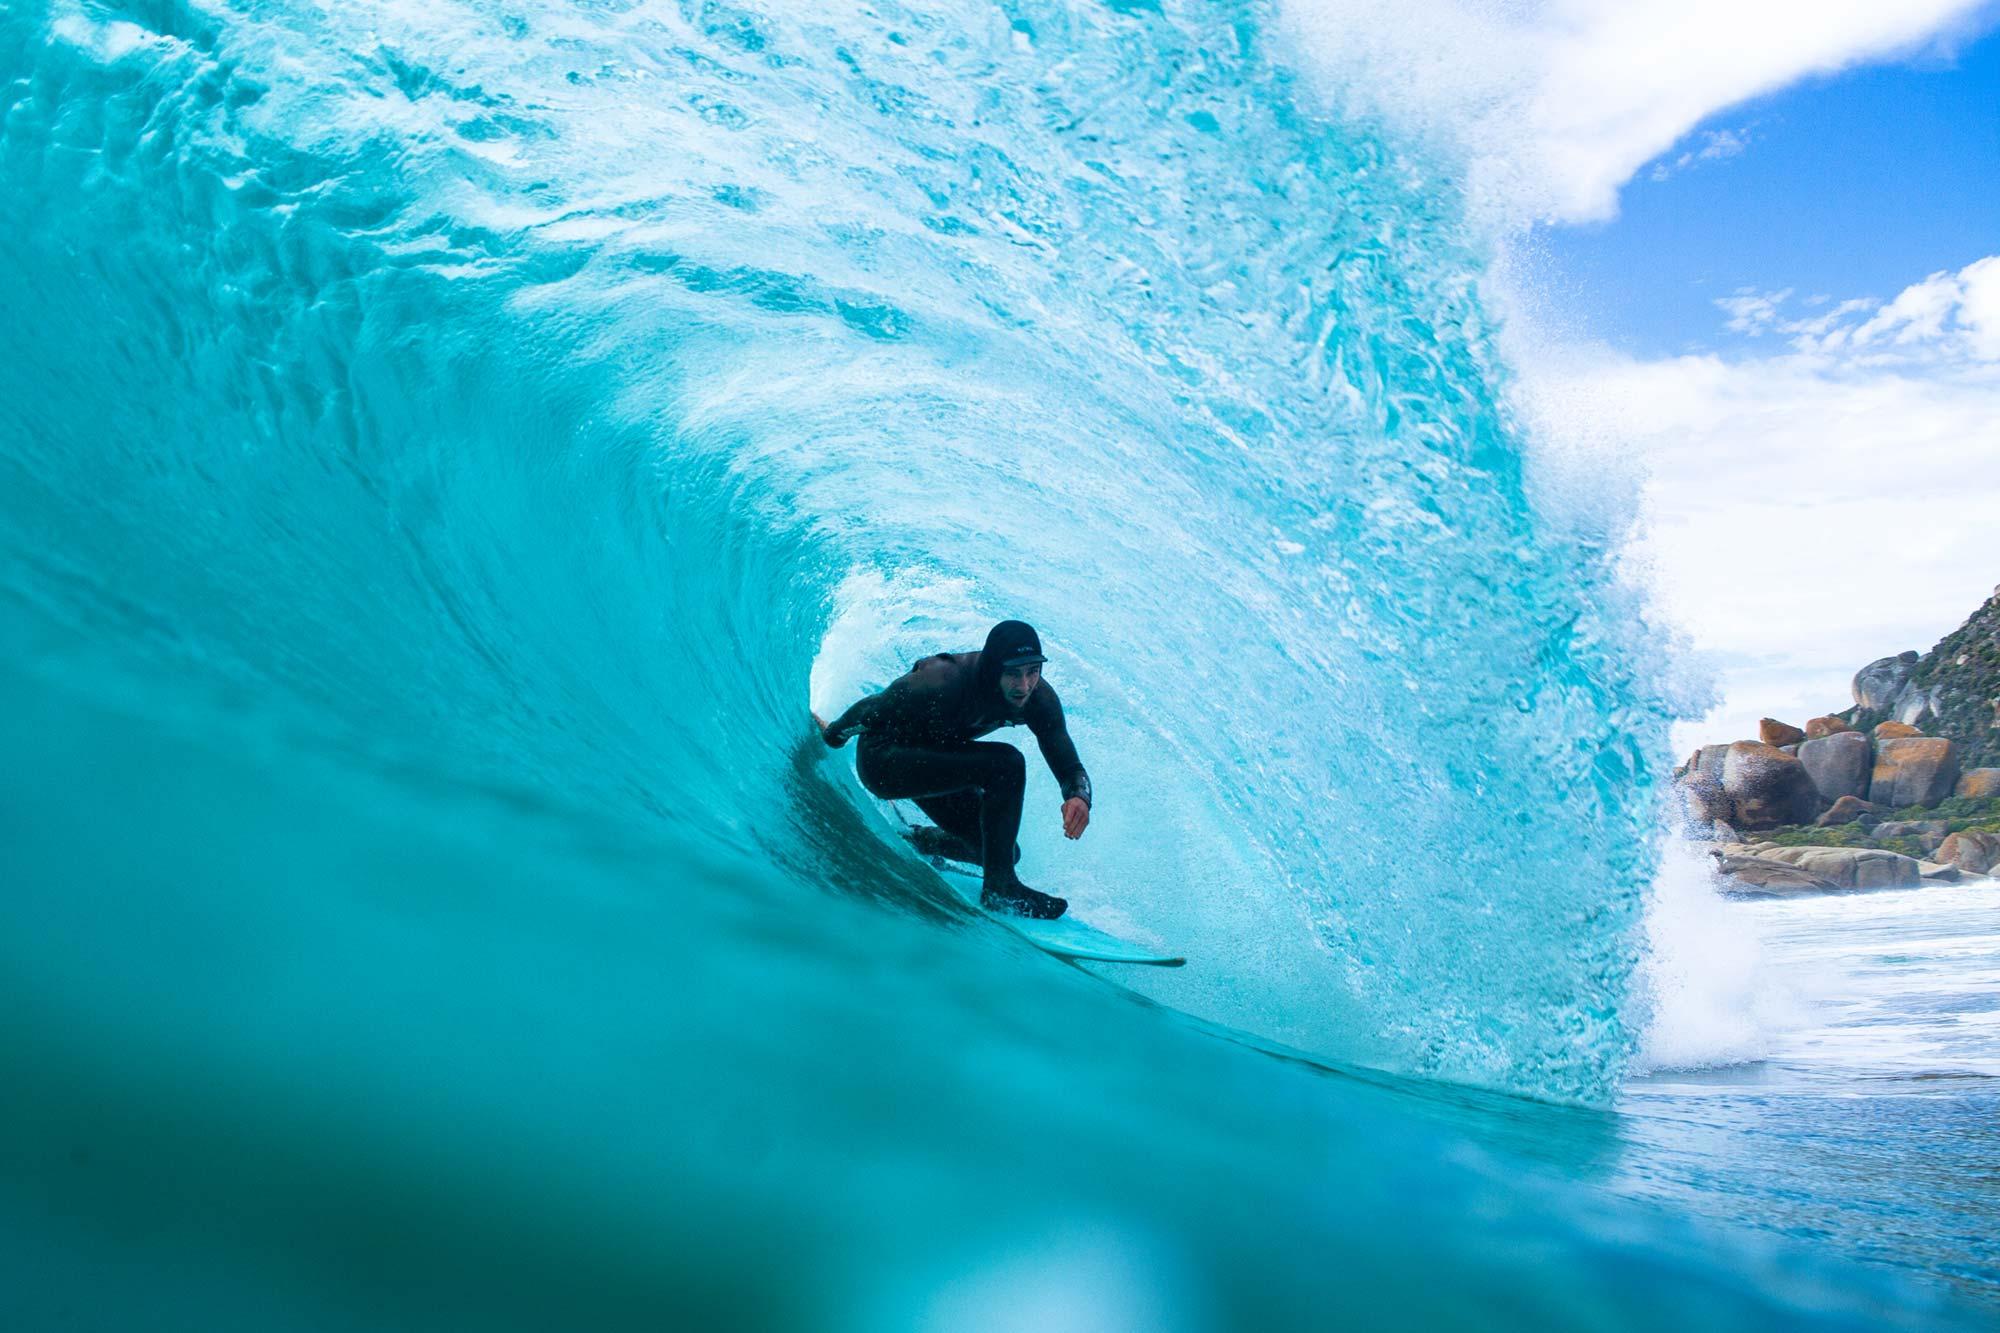 A vudu Surfer in a barrel at Llandudno